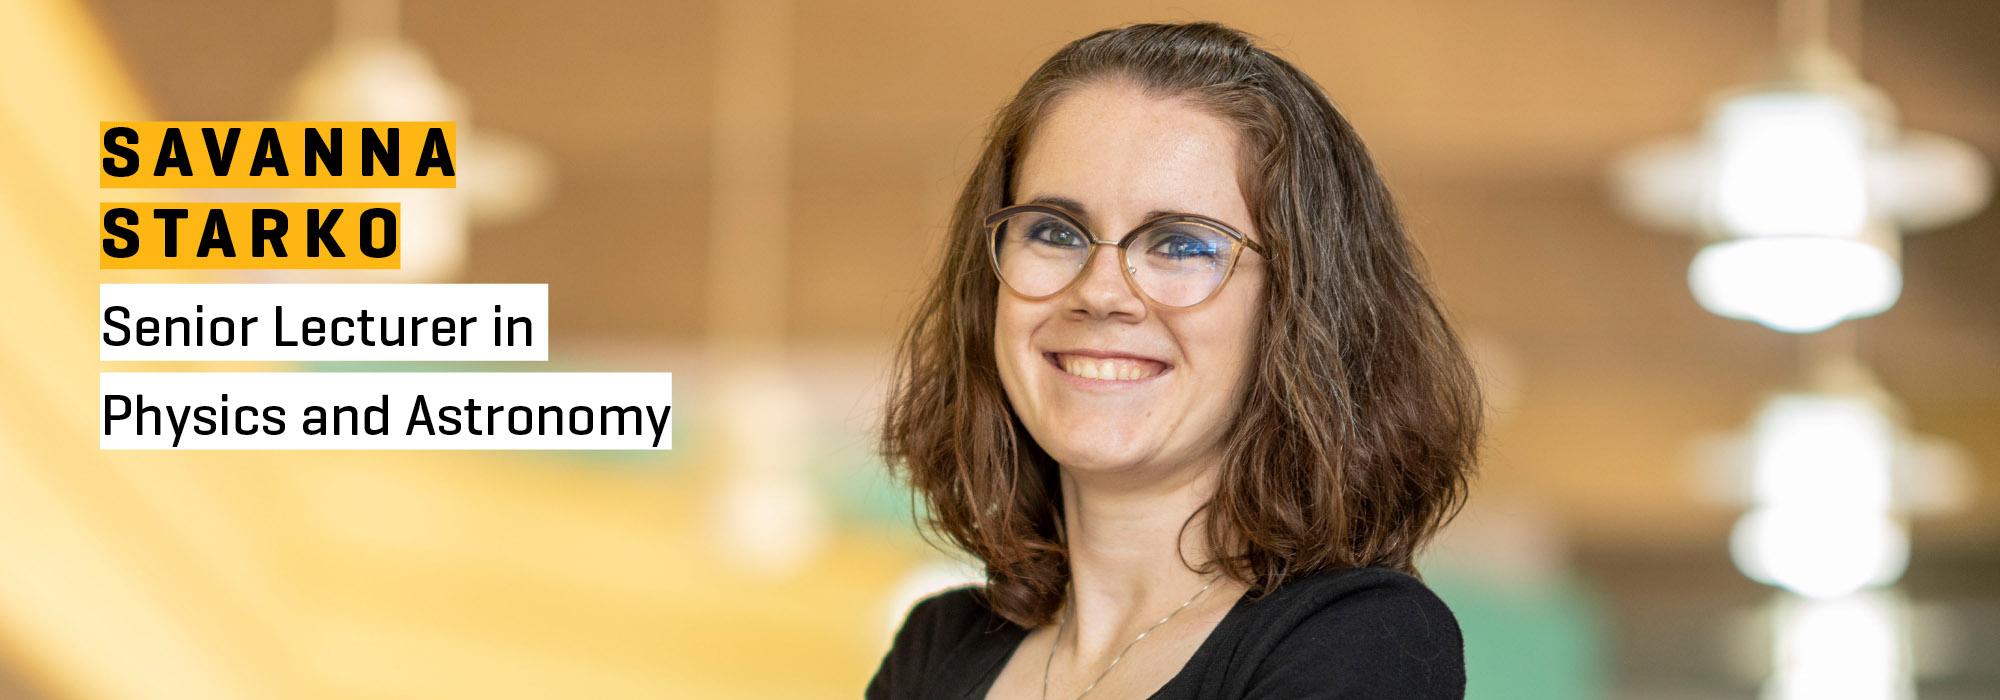 New faculty Savanna Starko: Seeking answers to big questions